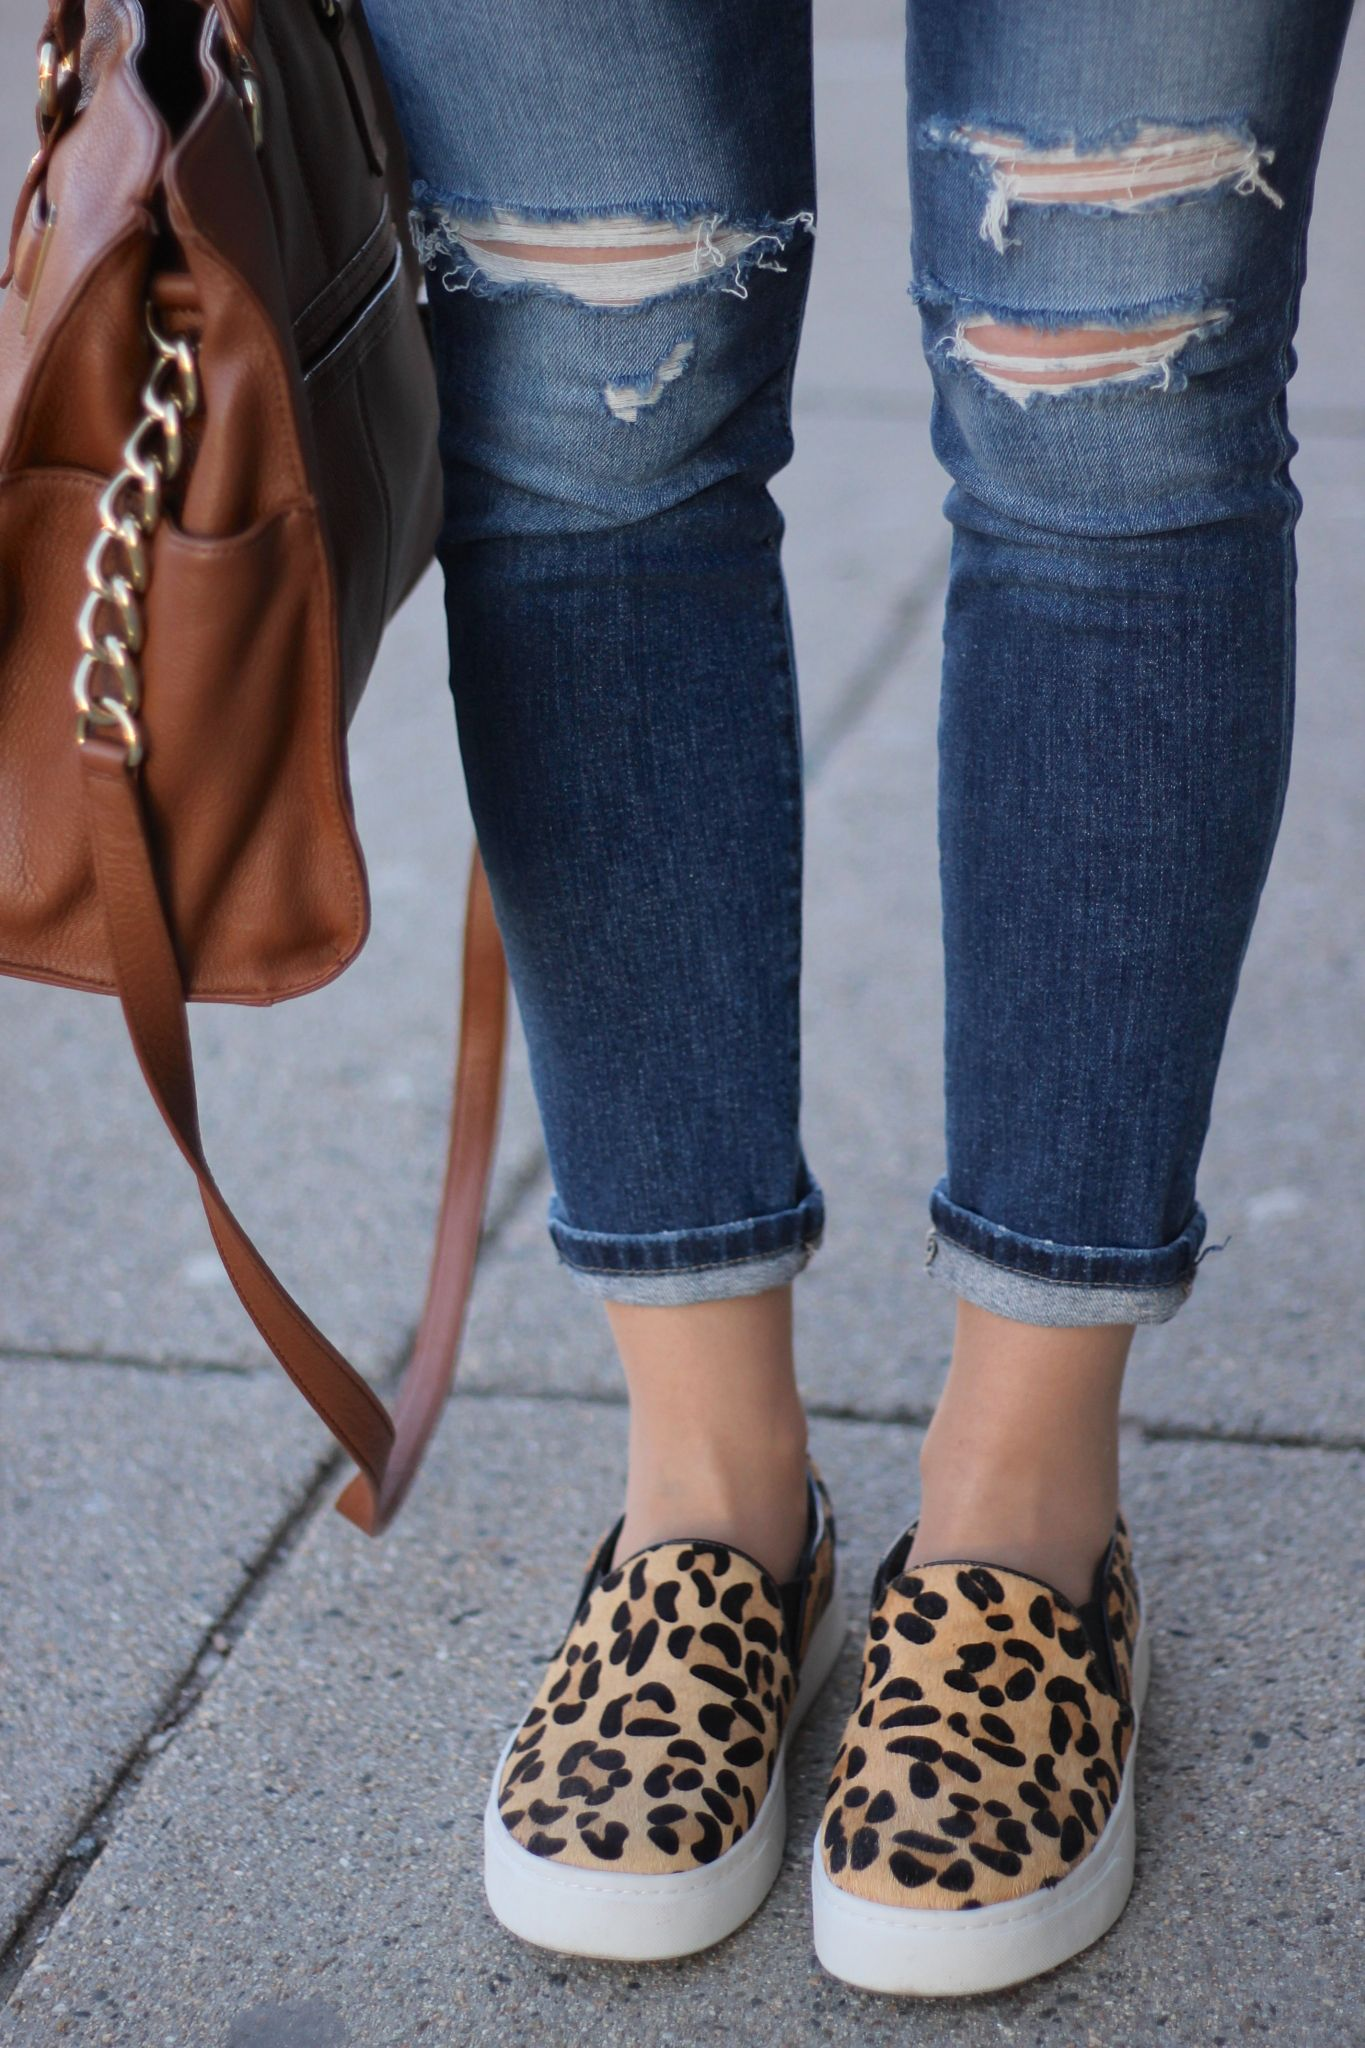 Women's Shoes Athletic Shoes Sam Edelman ~ Woman's $175 Black Slip On Boat Shoes ~ Adorable~